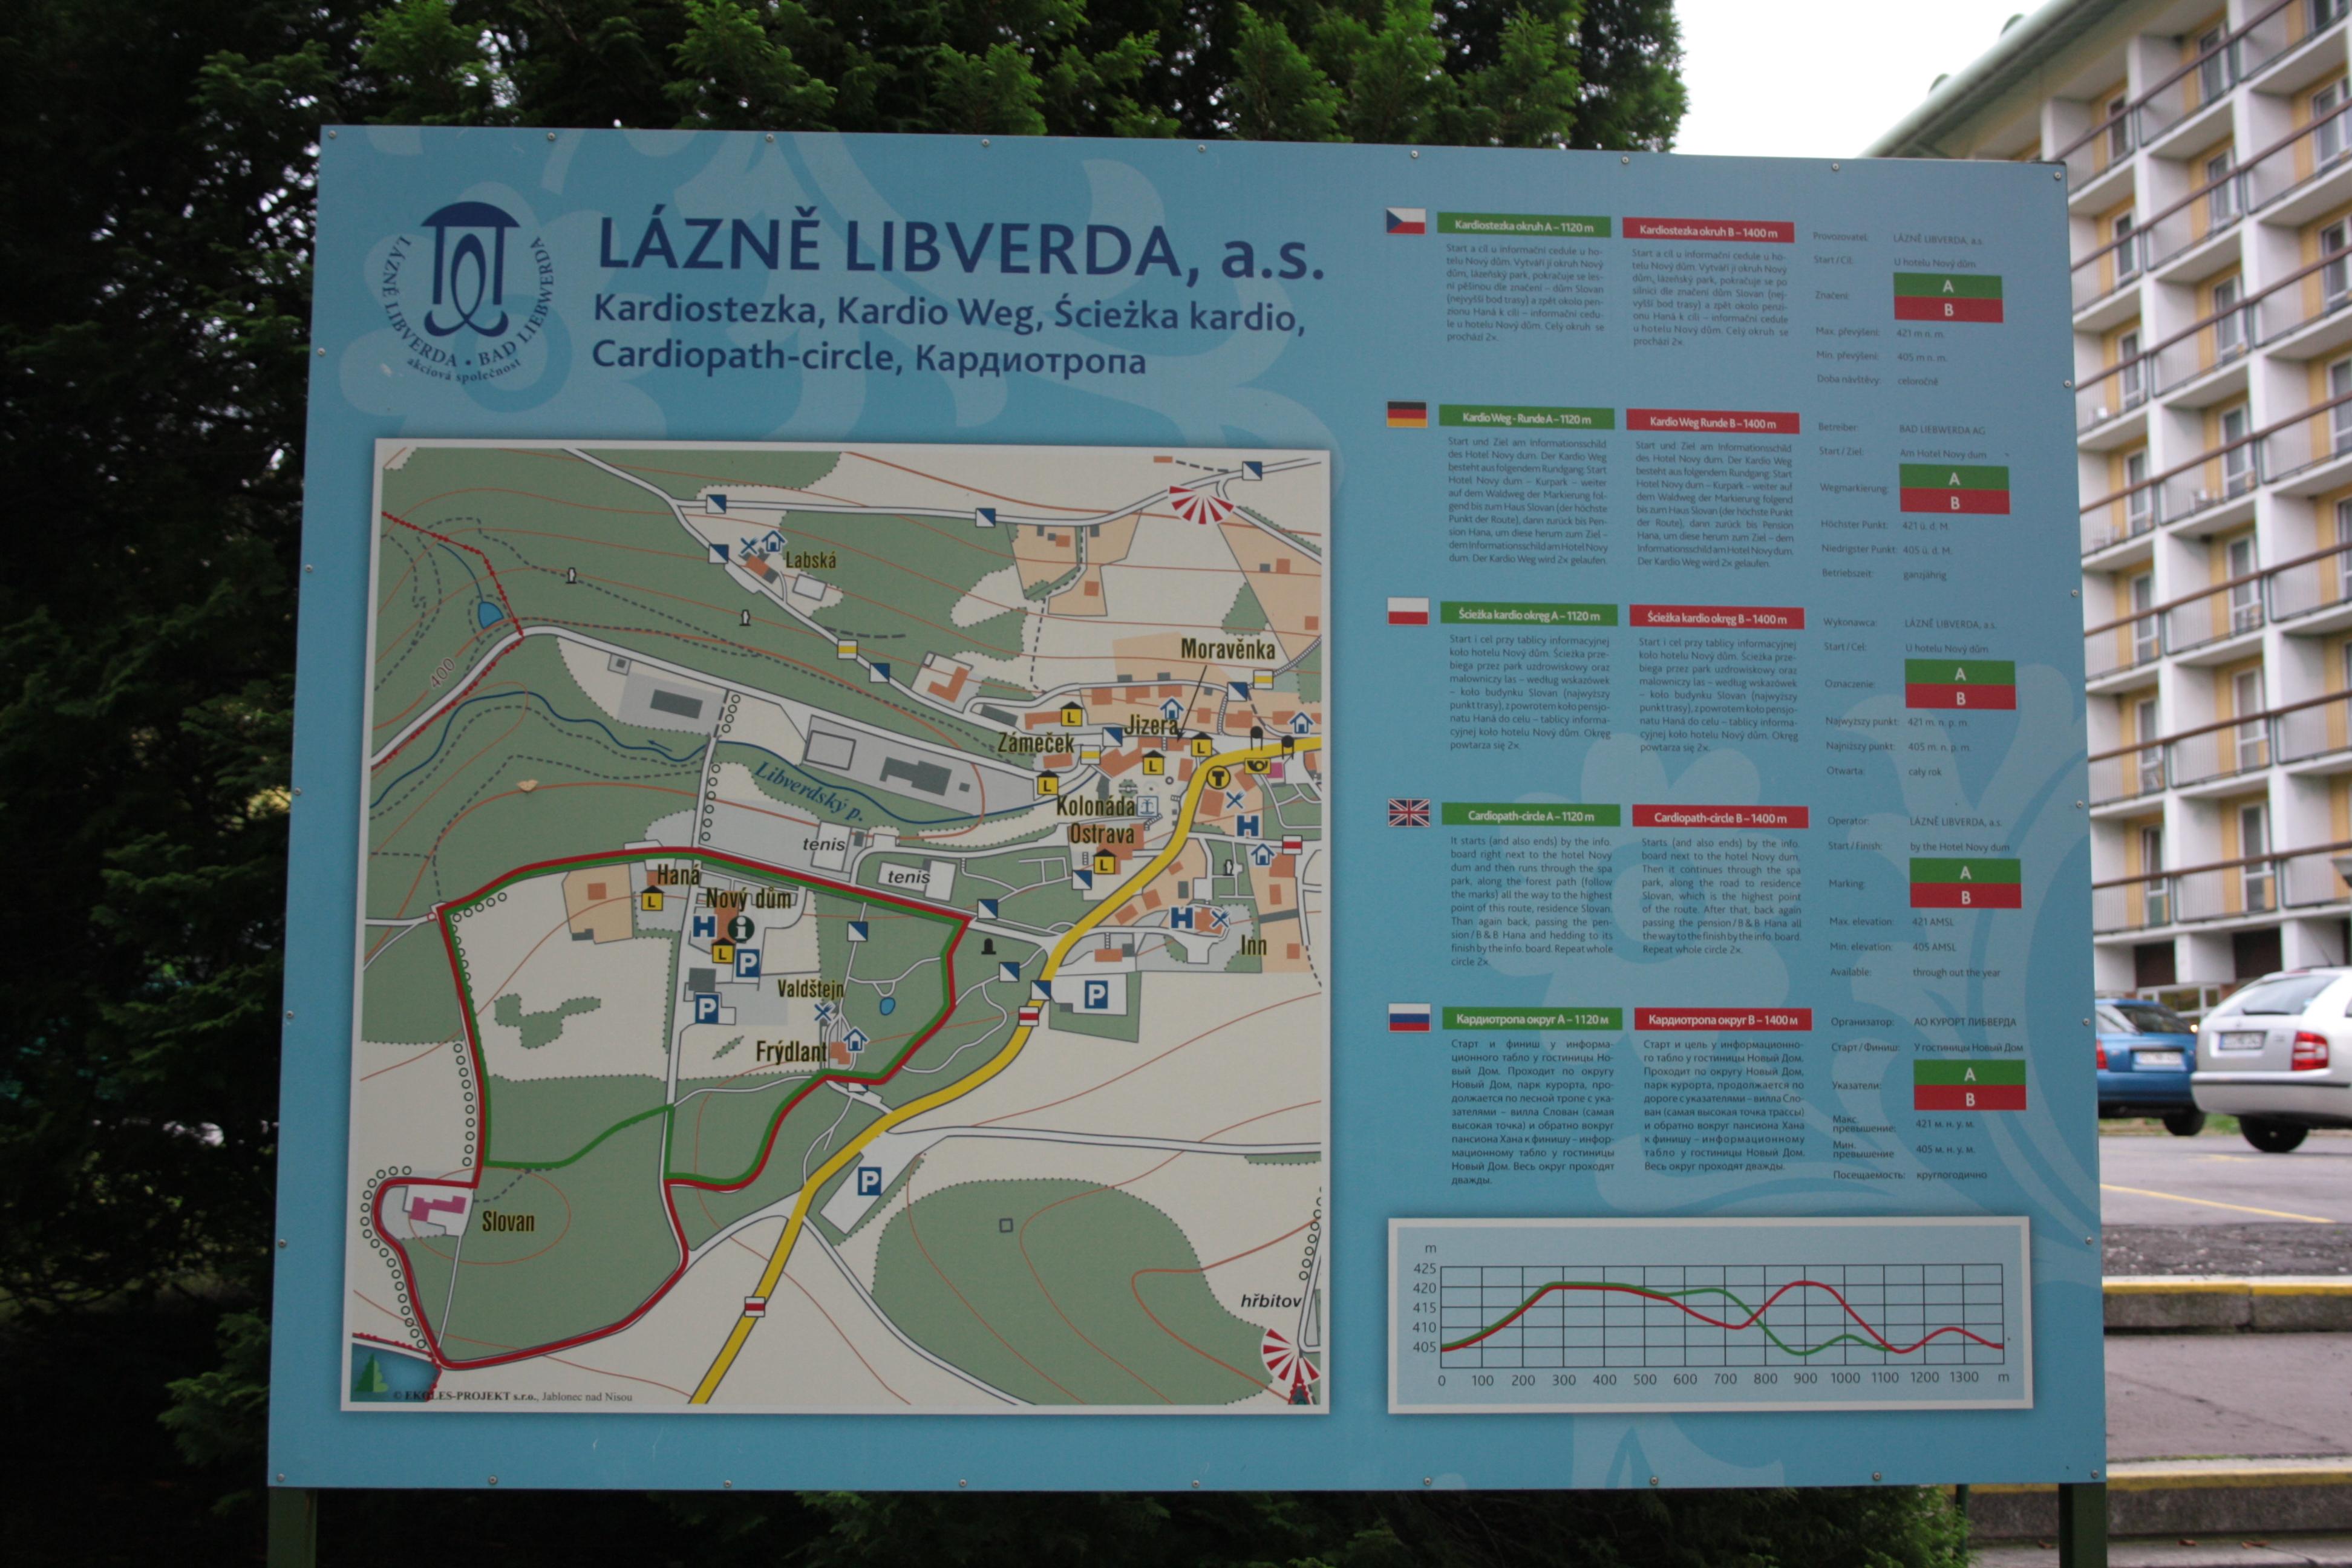 File Lazne Libverda Mapa Kardiostezky Jpg Wikimedia Commons